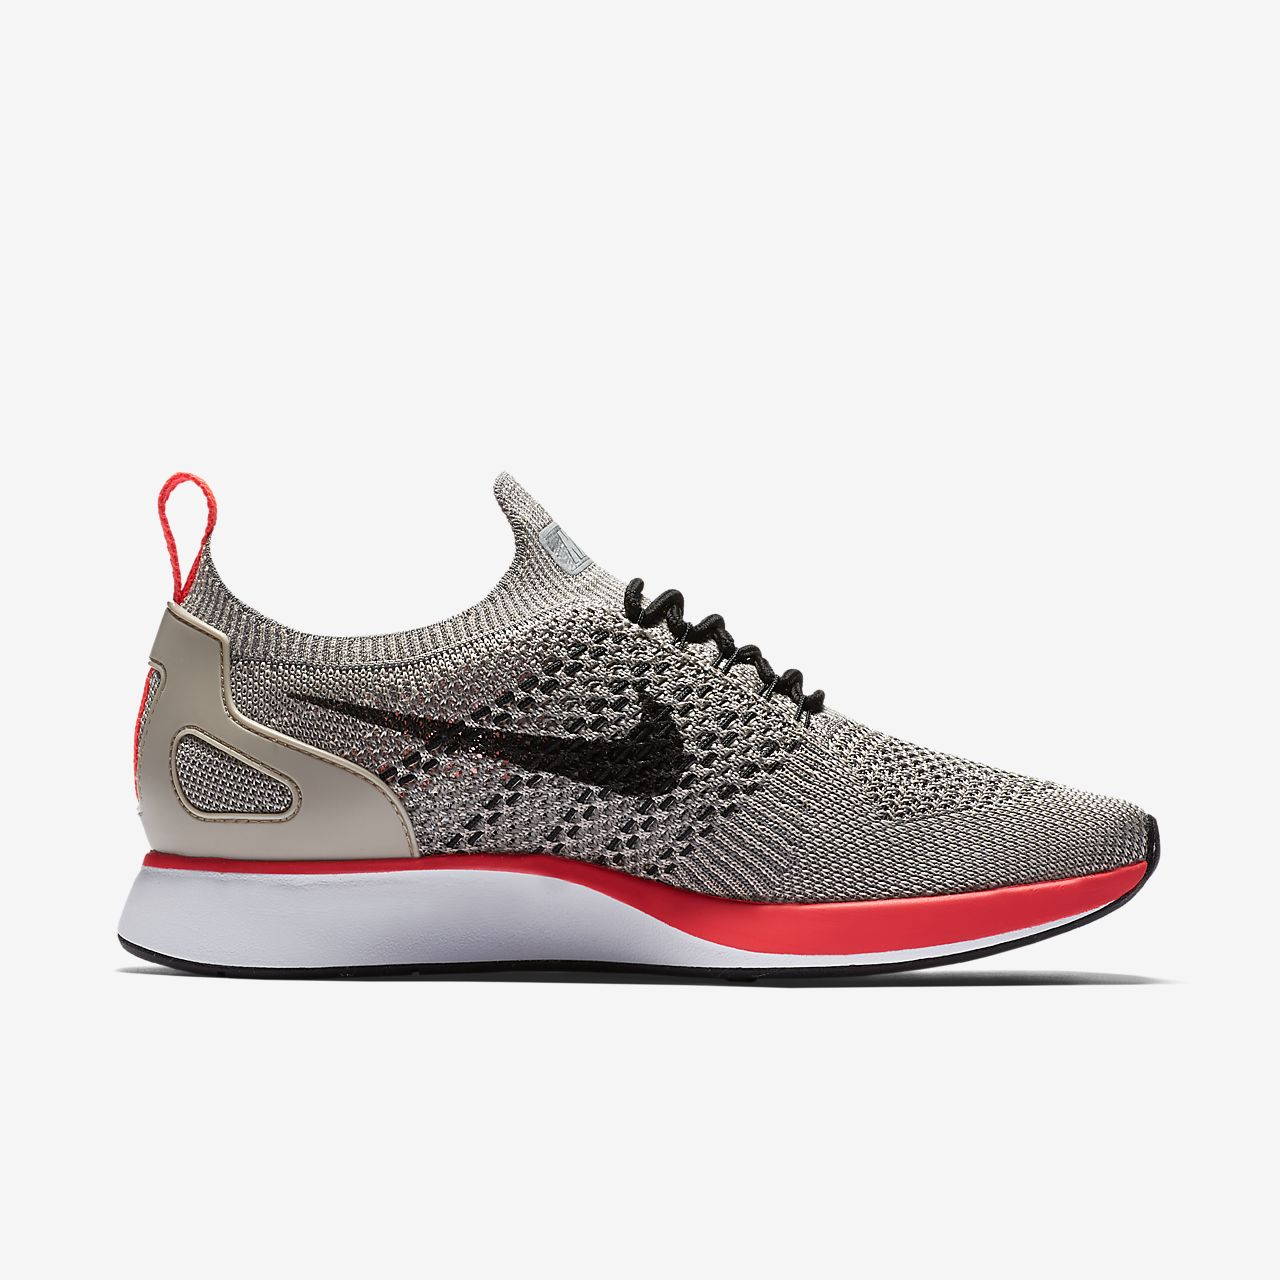 Nike Air Zoom Mariah Flyknit Racer Chaussures Baskets Lo Gris HXCRwyAN